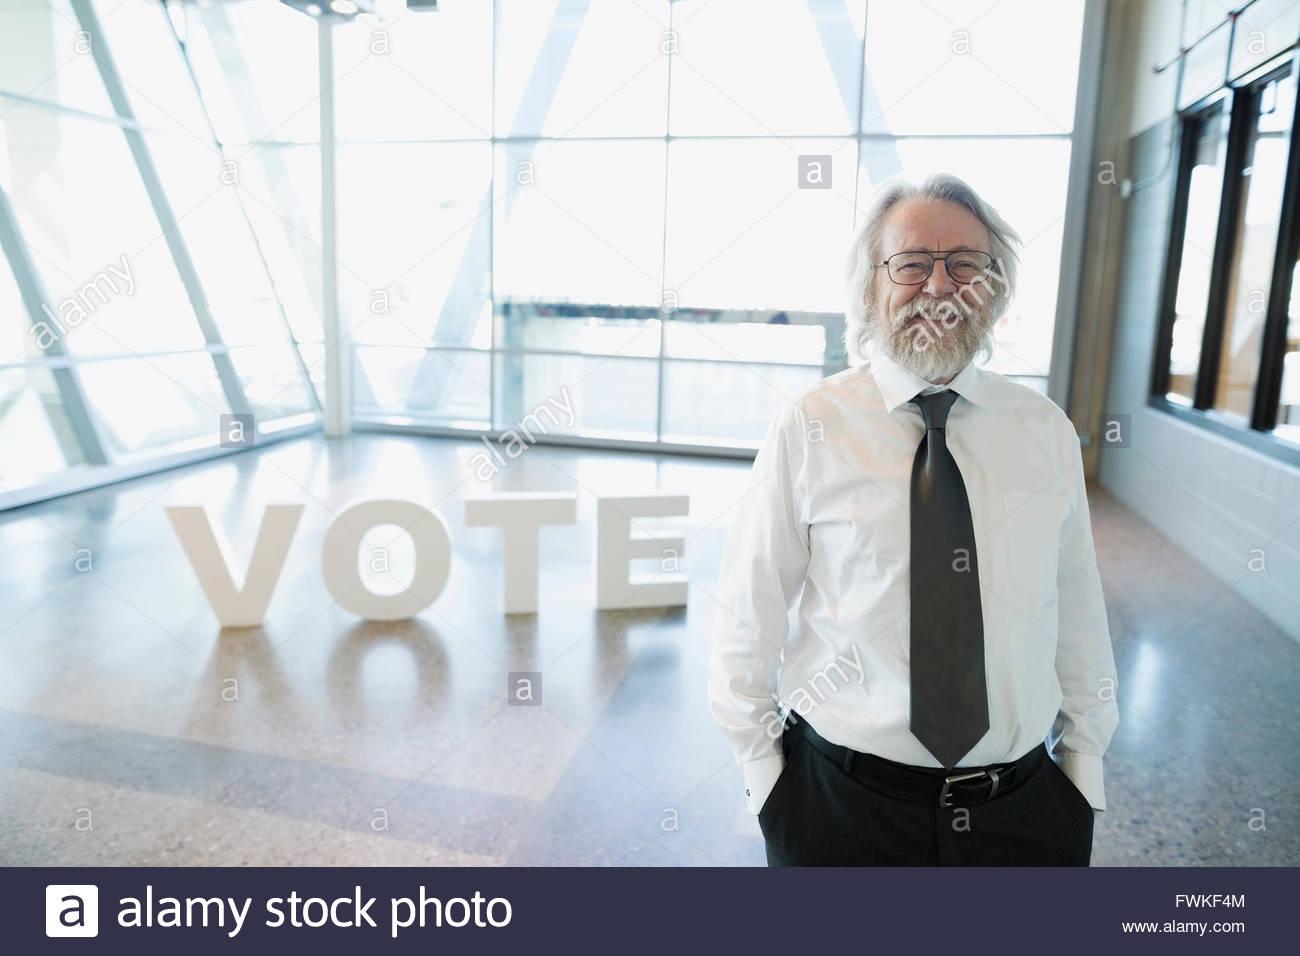 Porträt senior woman vor der Abstimmung text Stockbild